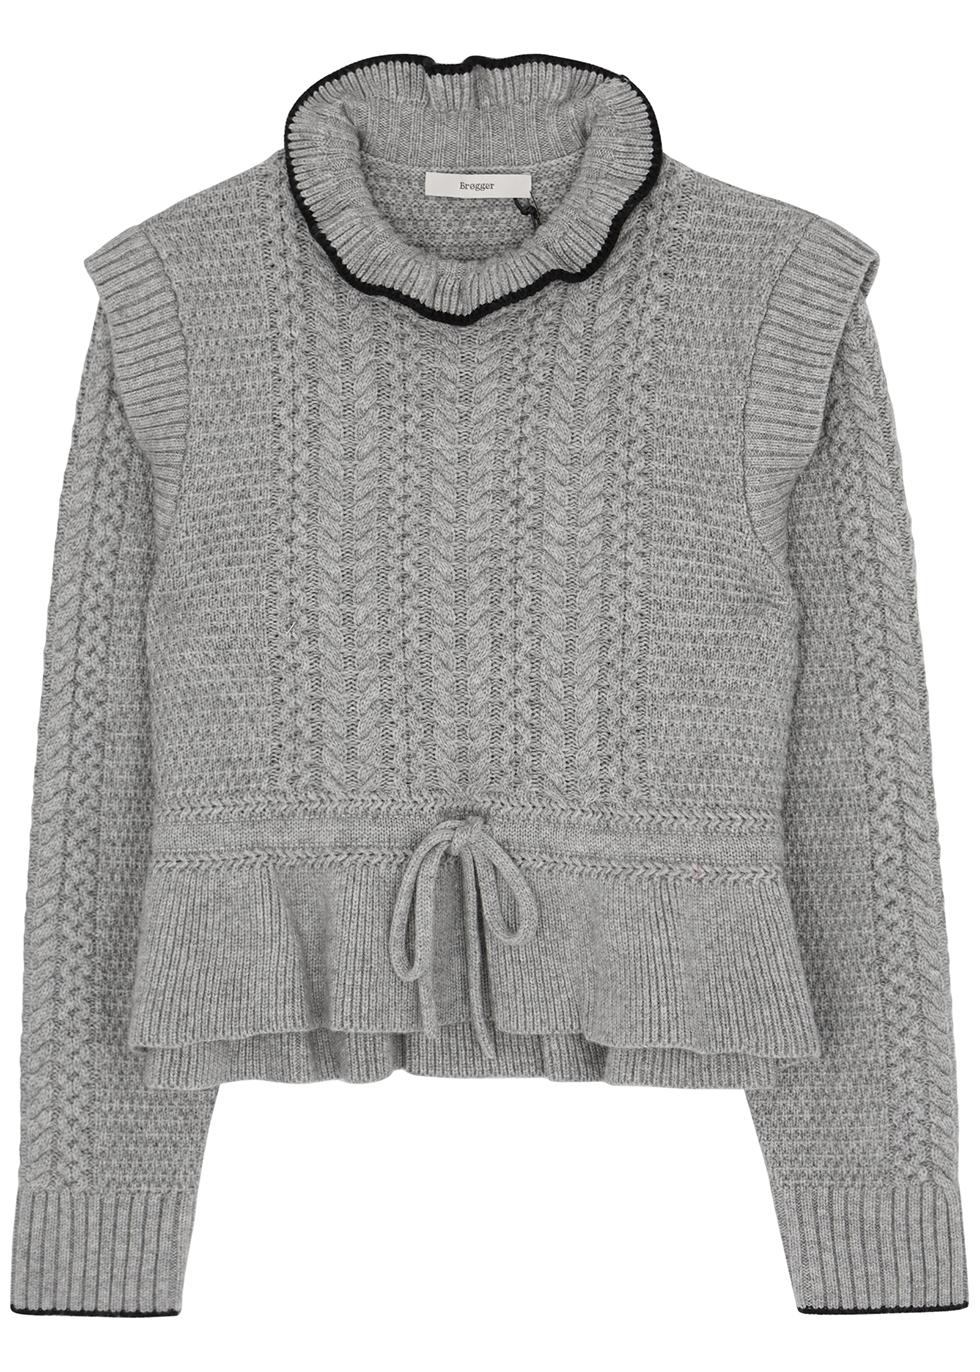 Ingrid grey cable-knit jumper